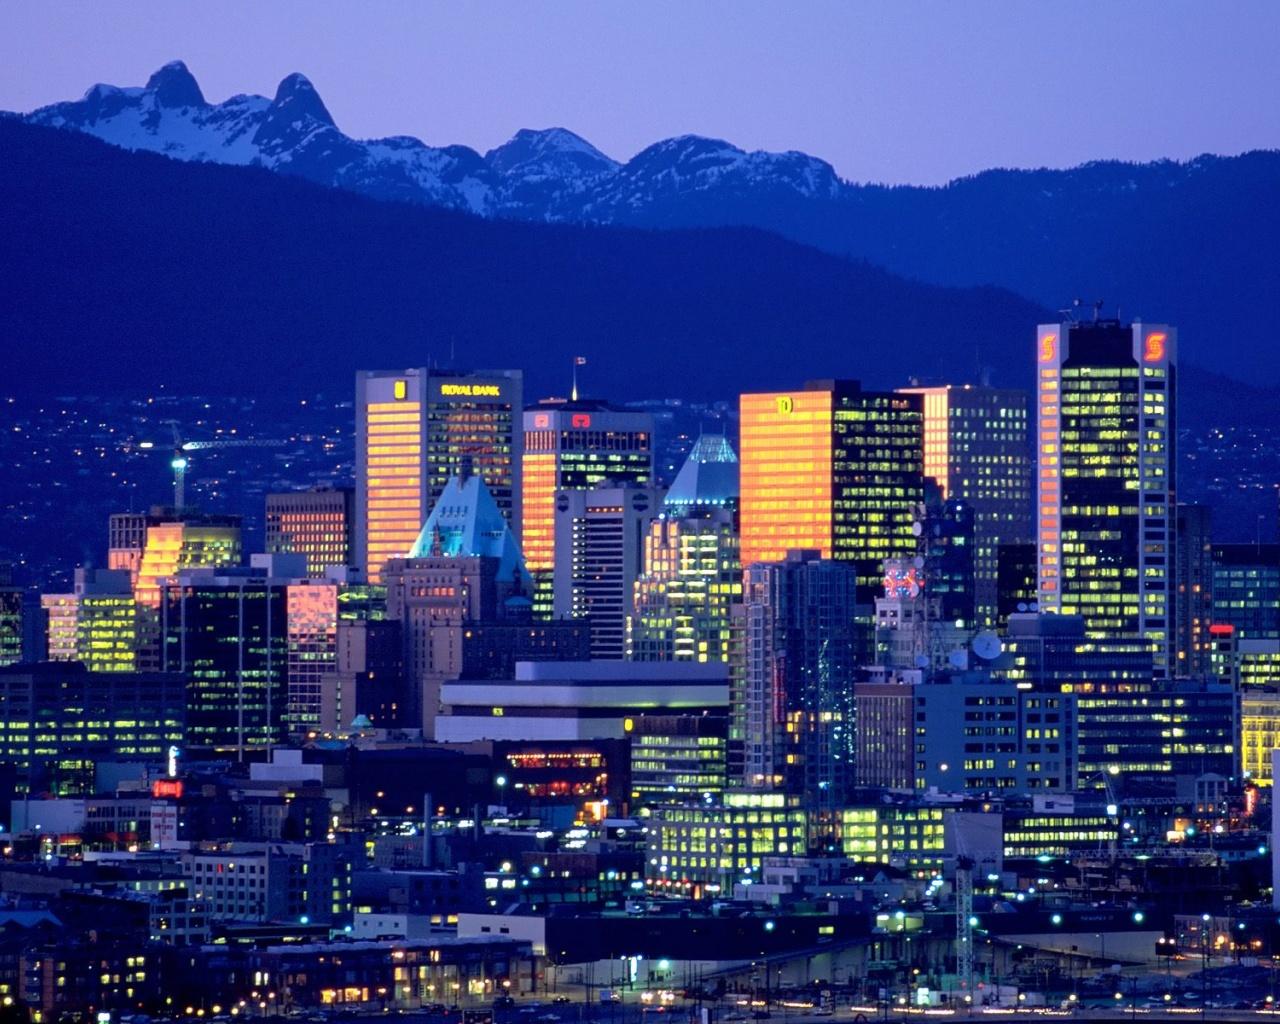 1280x1024 Vancouver Skyline desktop PC and Mac wallpaper 1280x1024